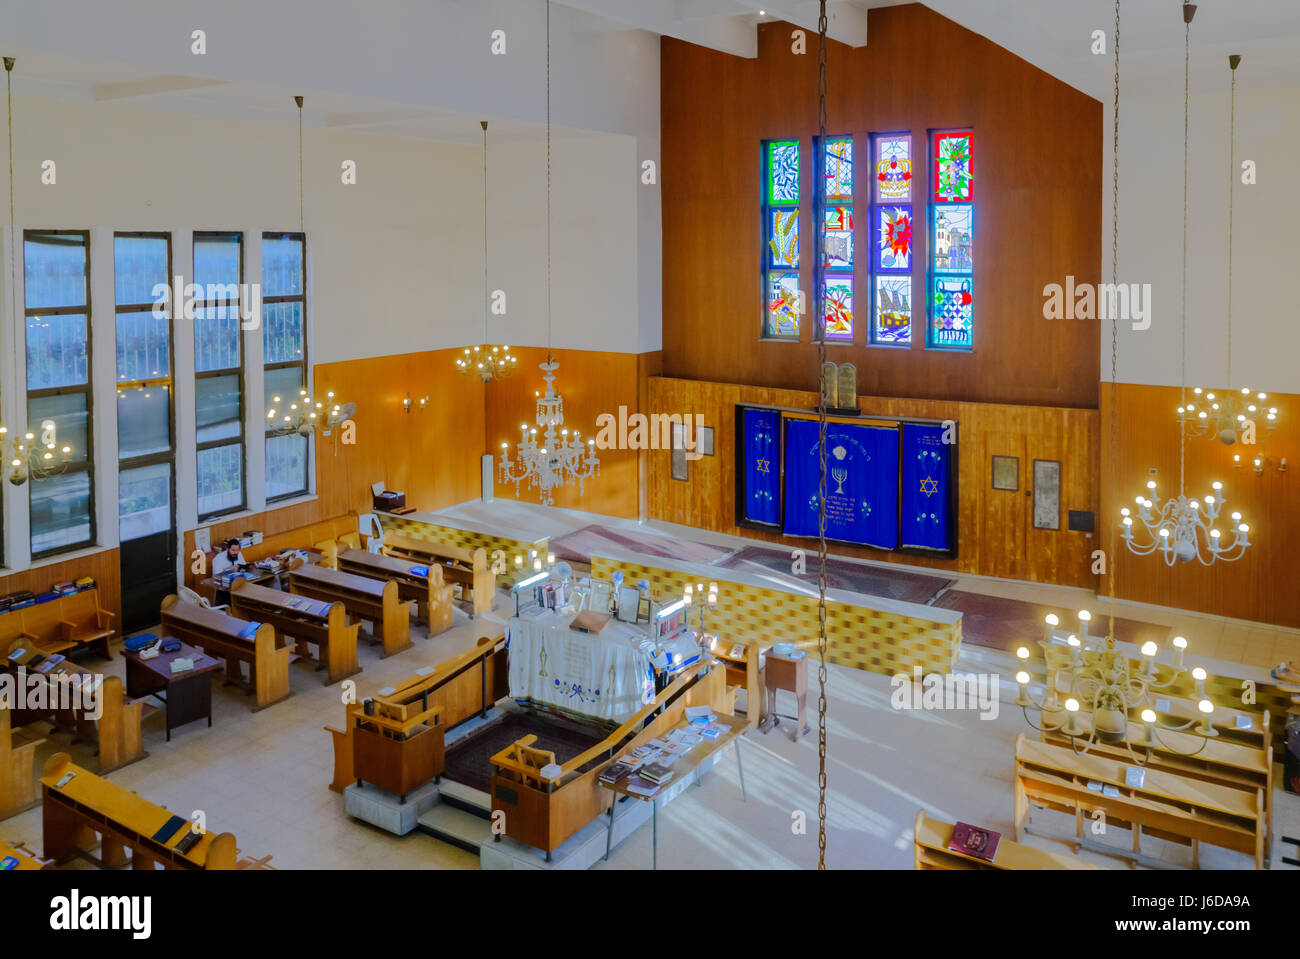 TEL-AVIV, ISRAEL - MAY 18, 2017: The Kol Yehuda Synagogue of the Aden Jewish community, with a prayer, in Tel-Aviv, - Stock Image